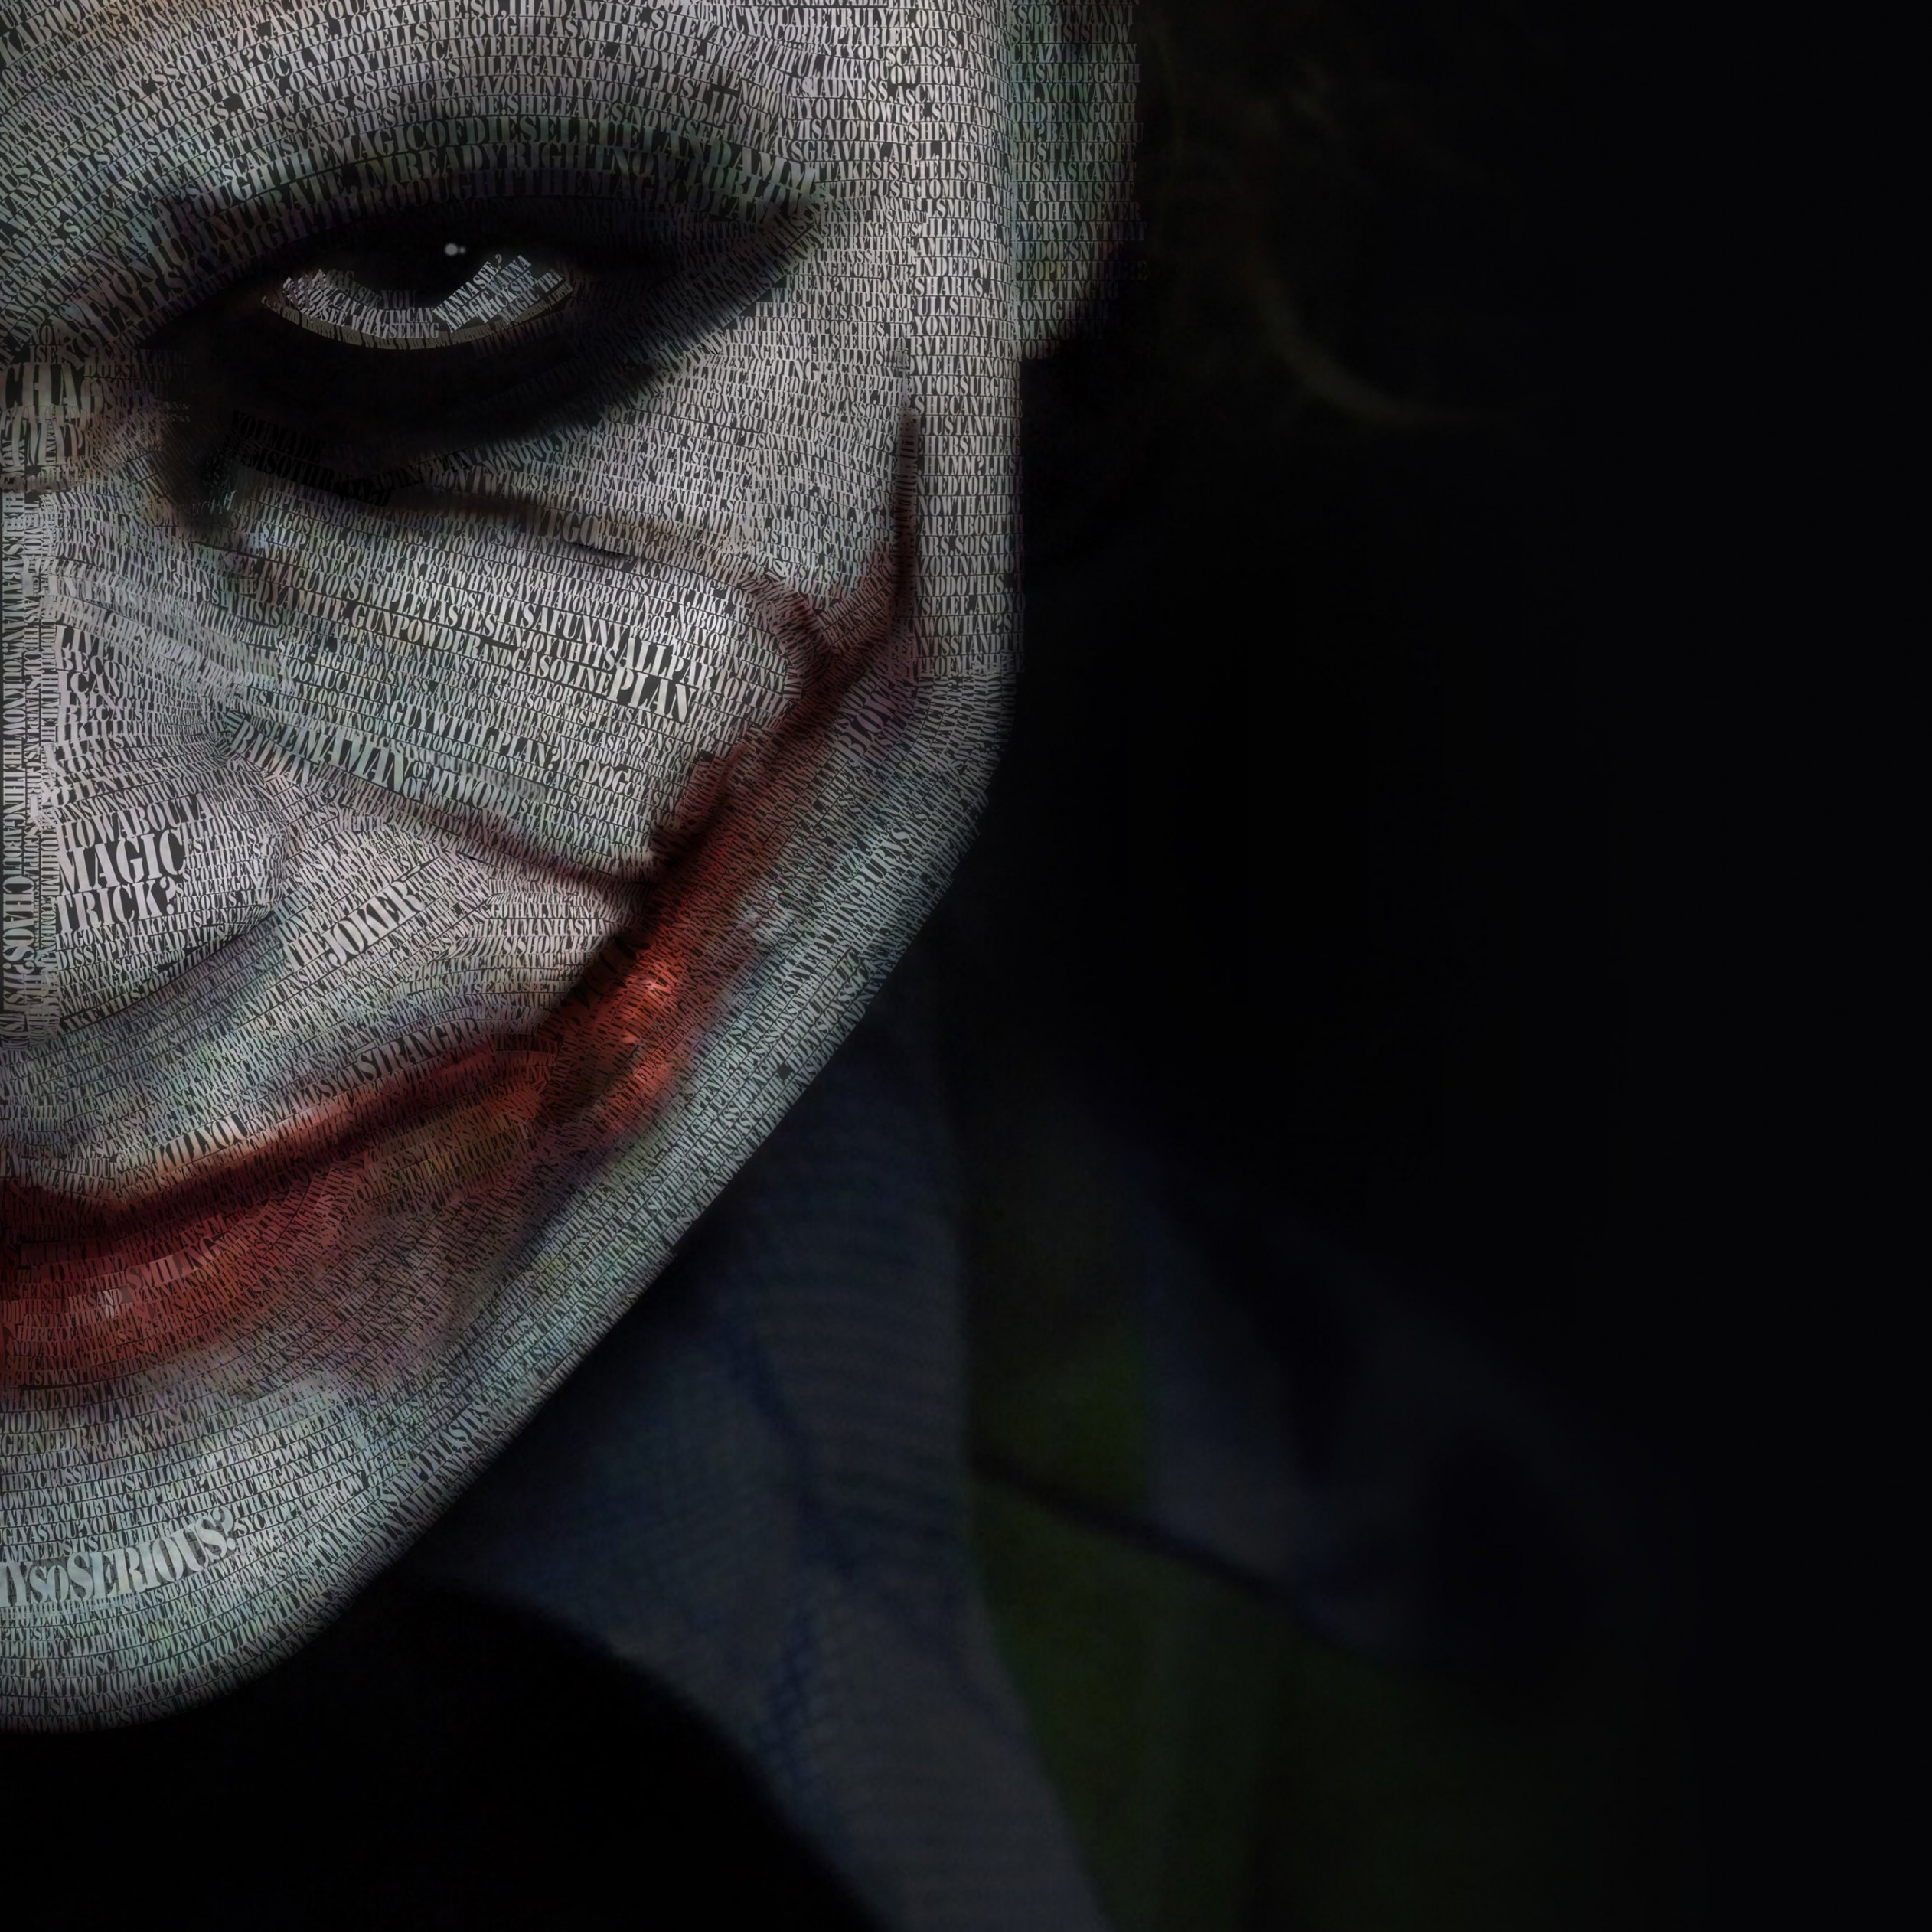 Hd wallpaper joker - Download The Joker Typeface Portrait Hd Wallpaper For Ipad